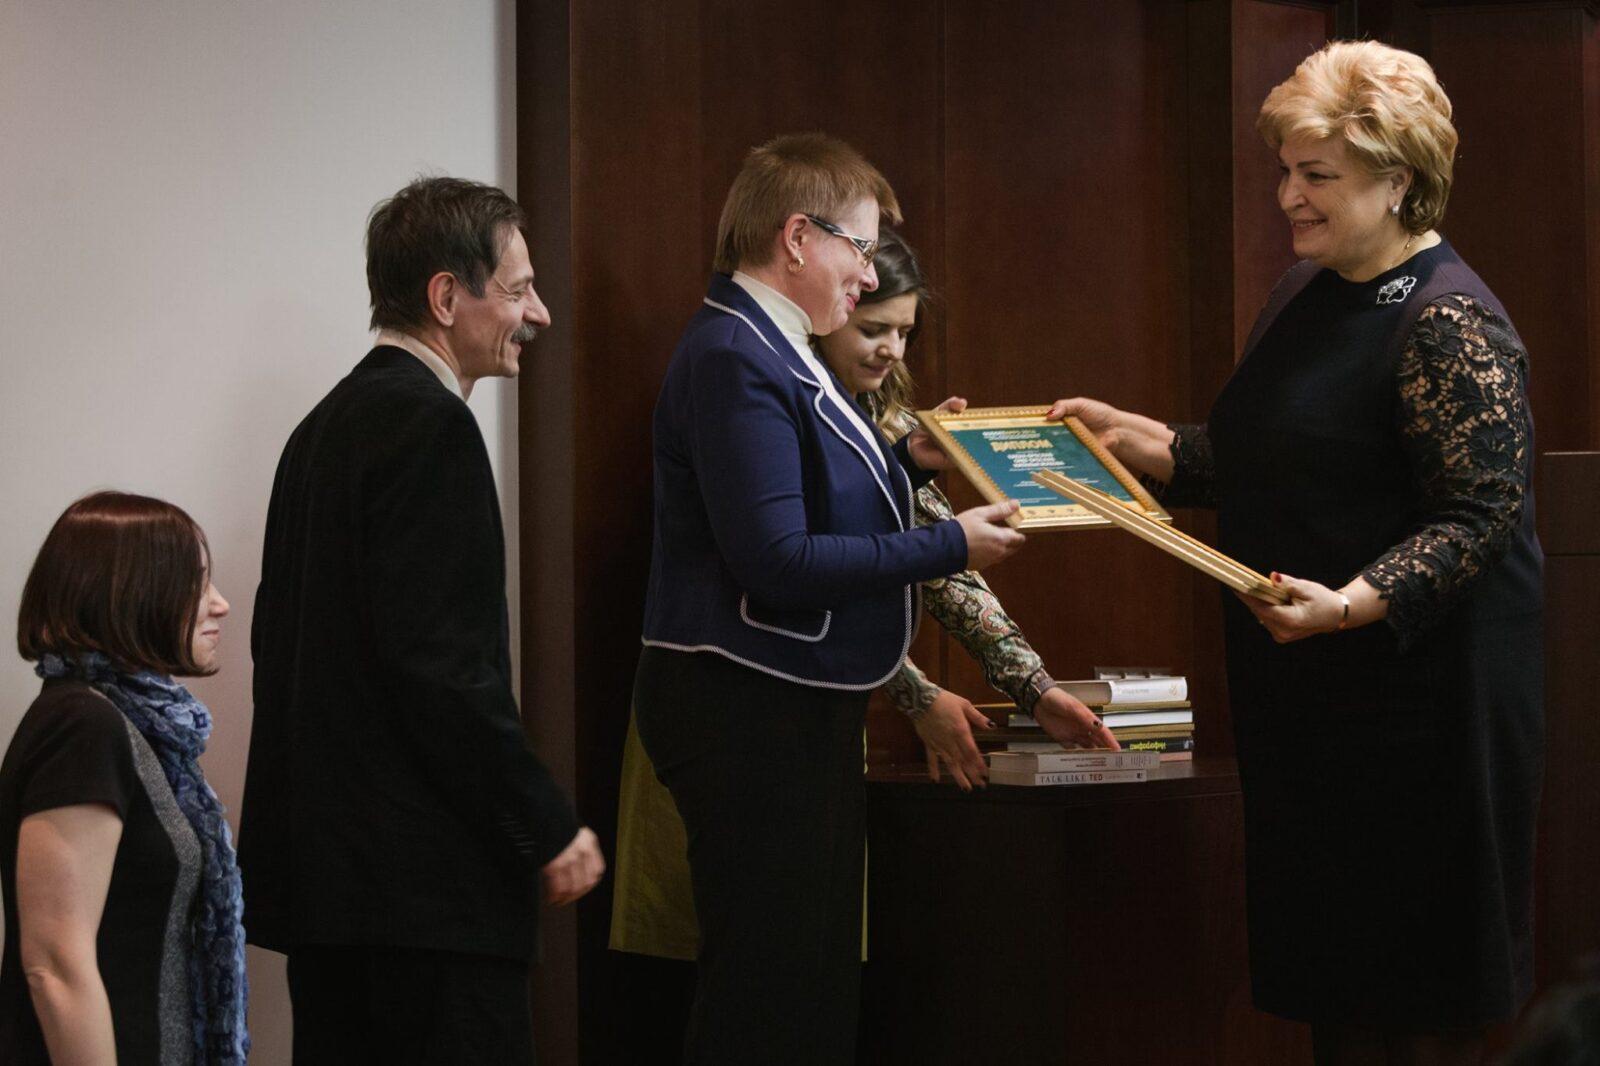 Команда Академии Пастухова выиграла конкурс Минфина РФ Budgetapps 2016